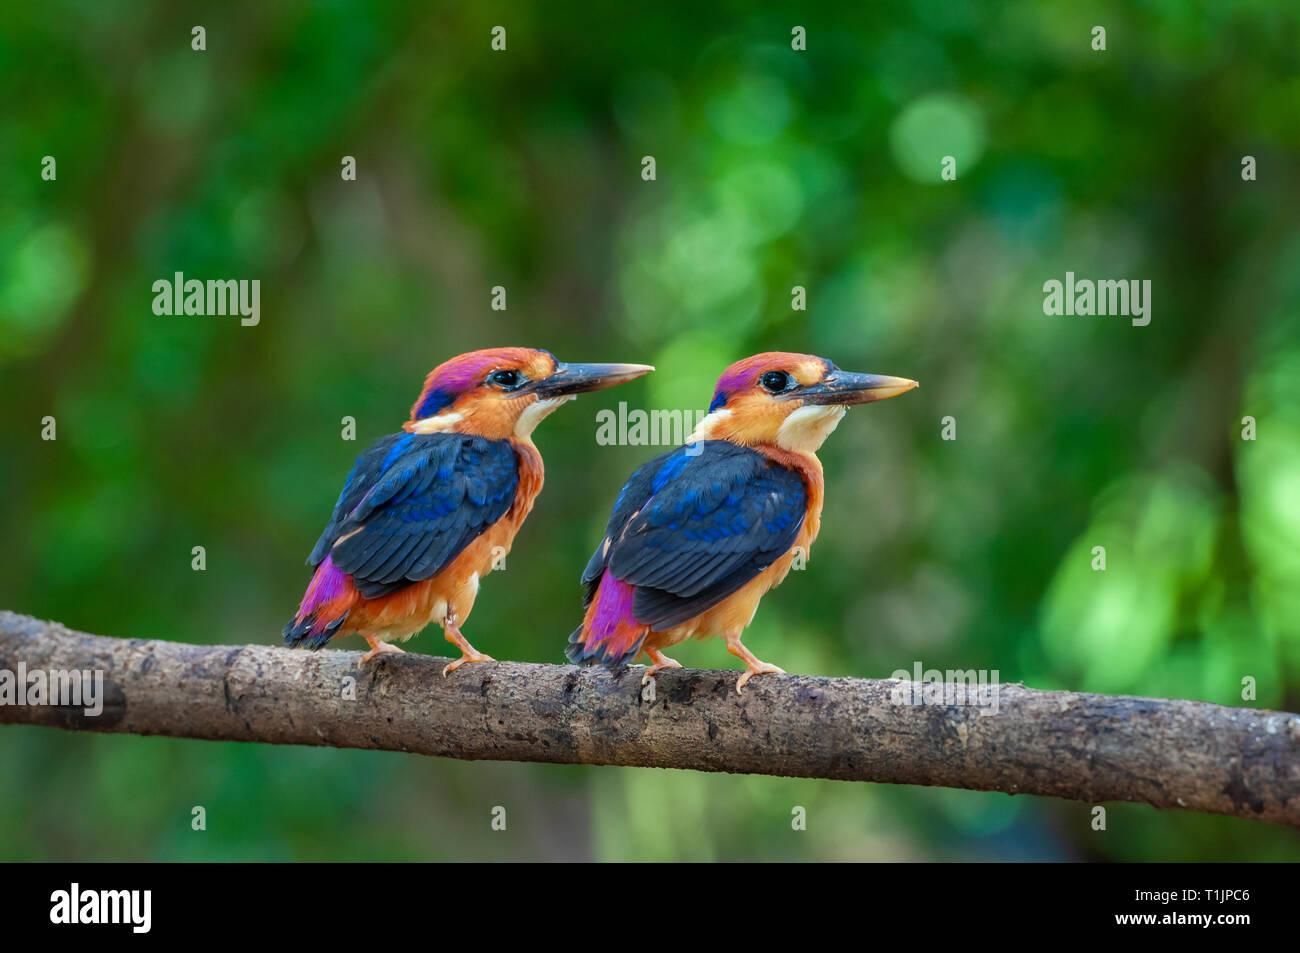 baby Oriental Dwarf Kingfishers  at Chiplun,Maharashtra,India - Stock Image